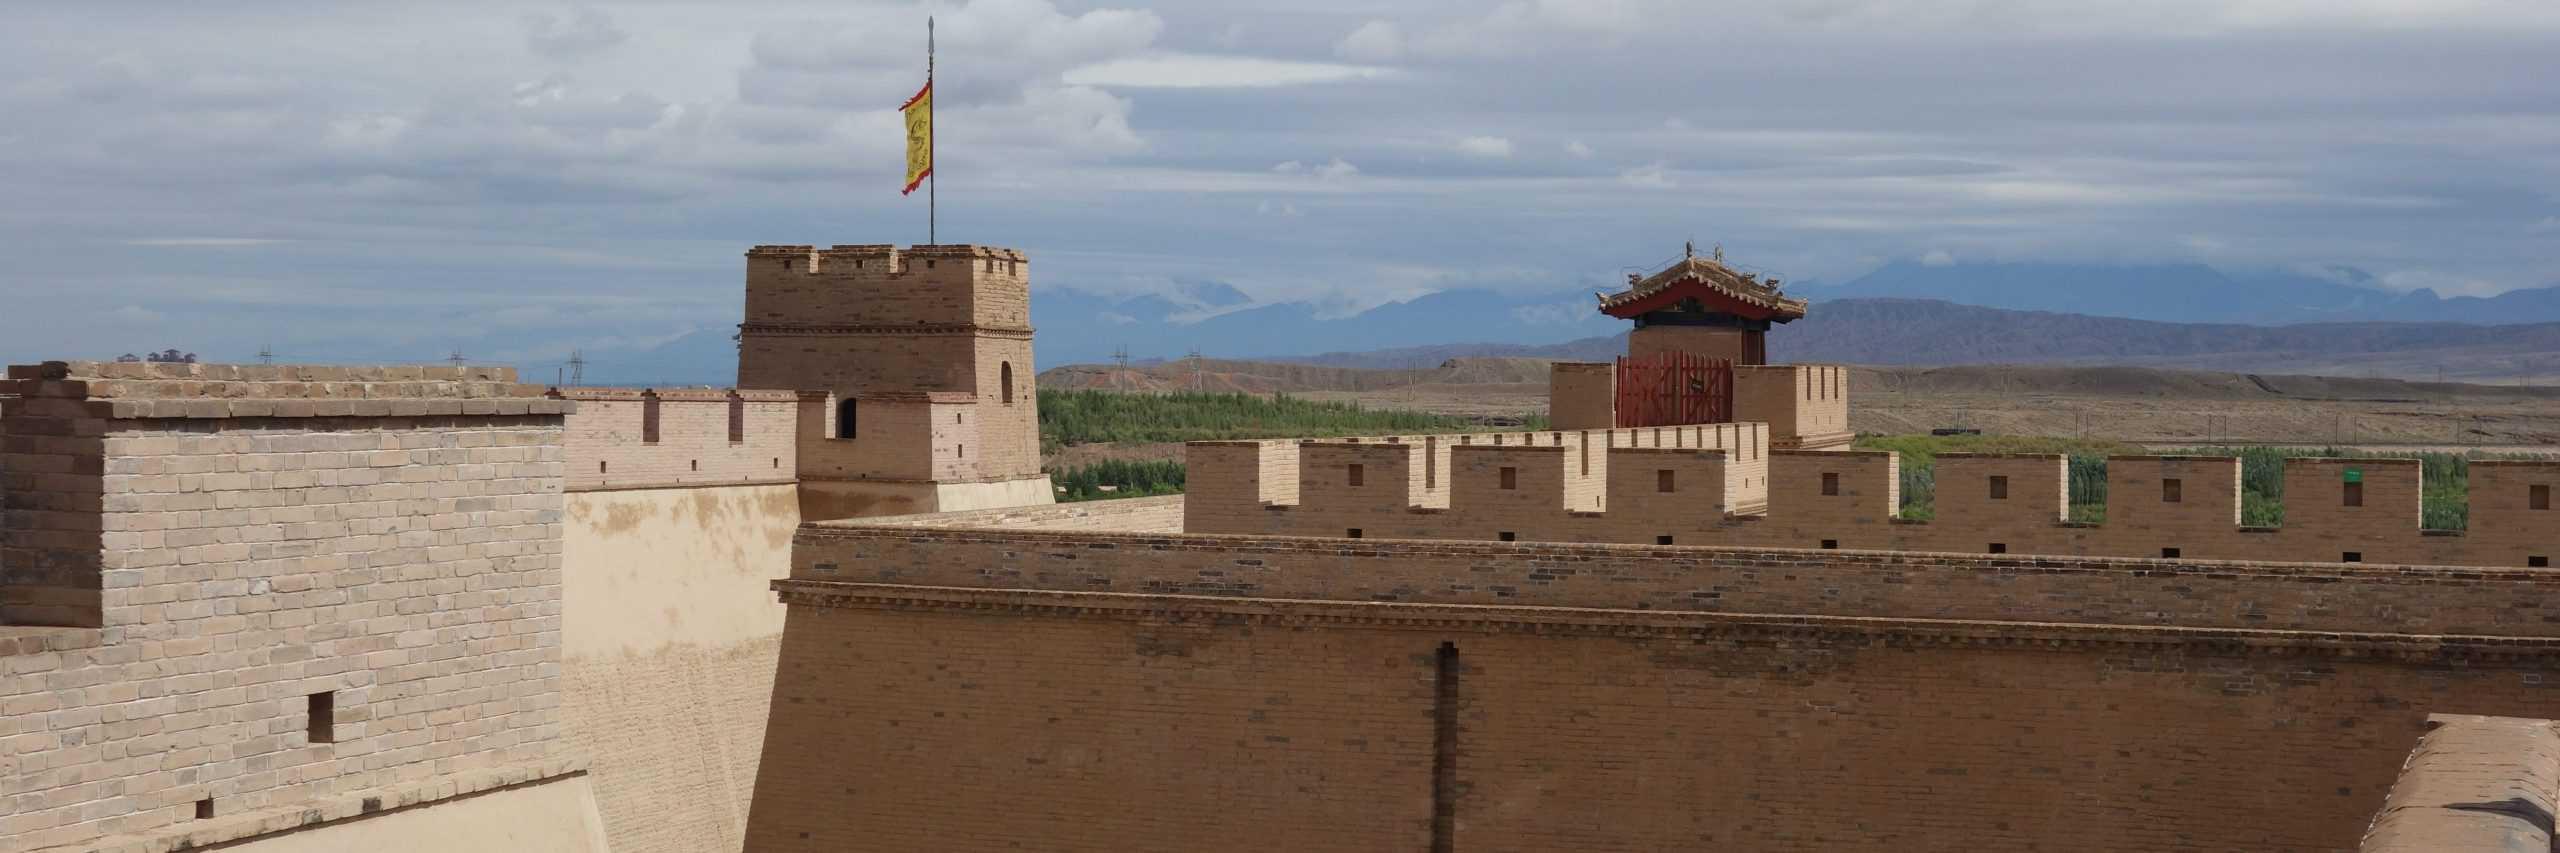 Jiayuguan Fort, China